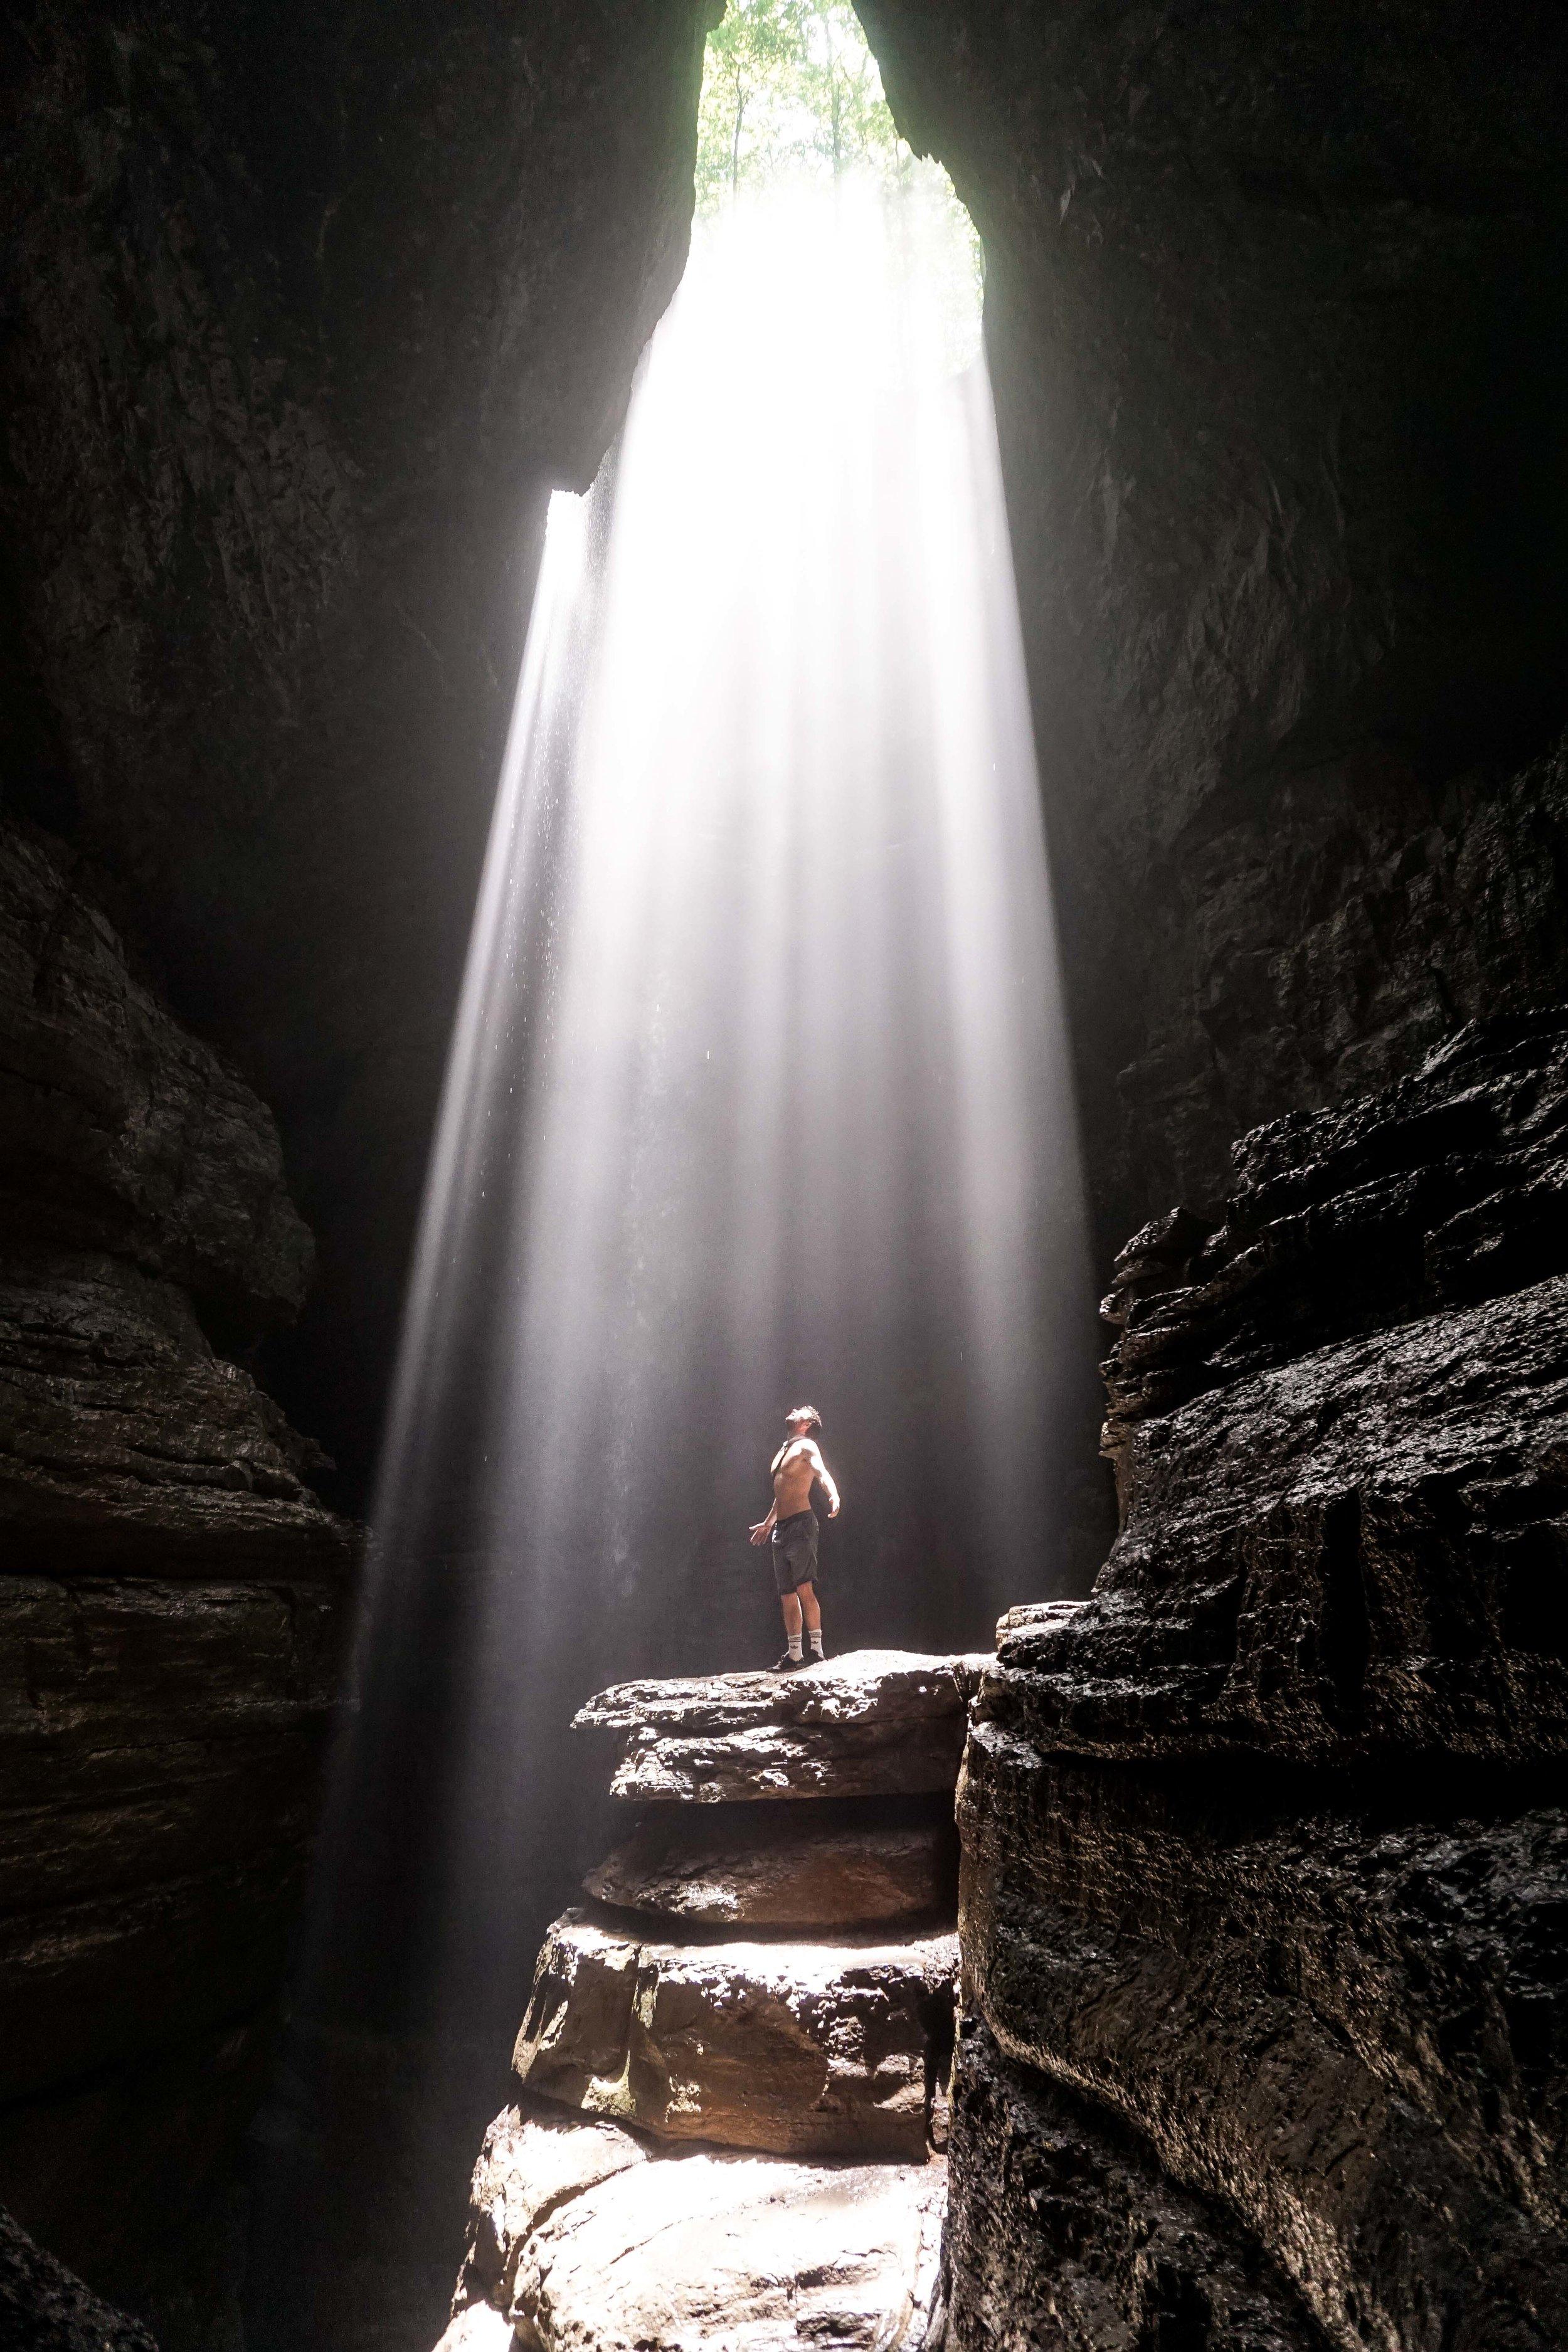 Stephen's Gap Cave, AL